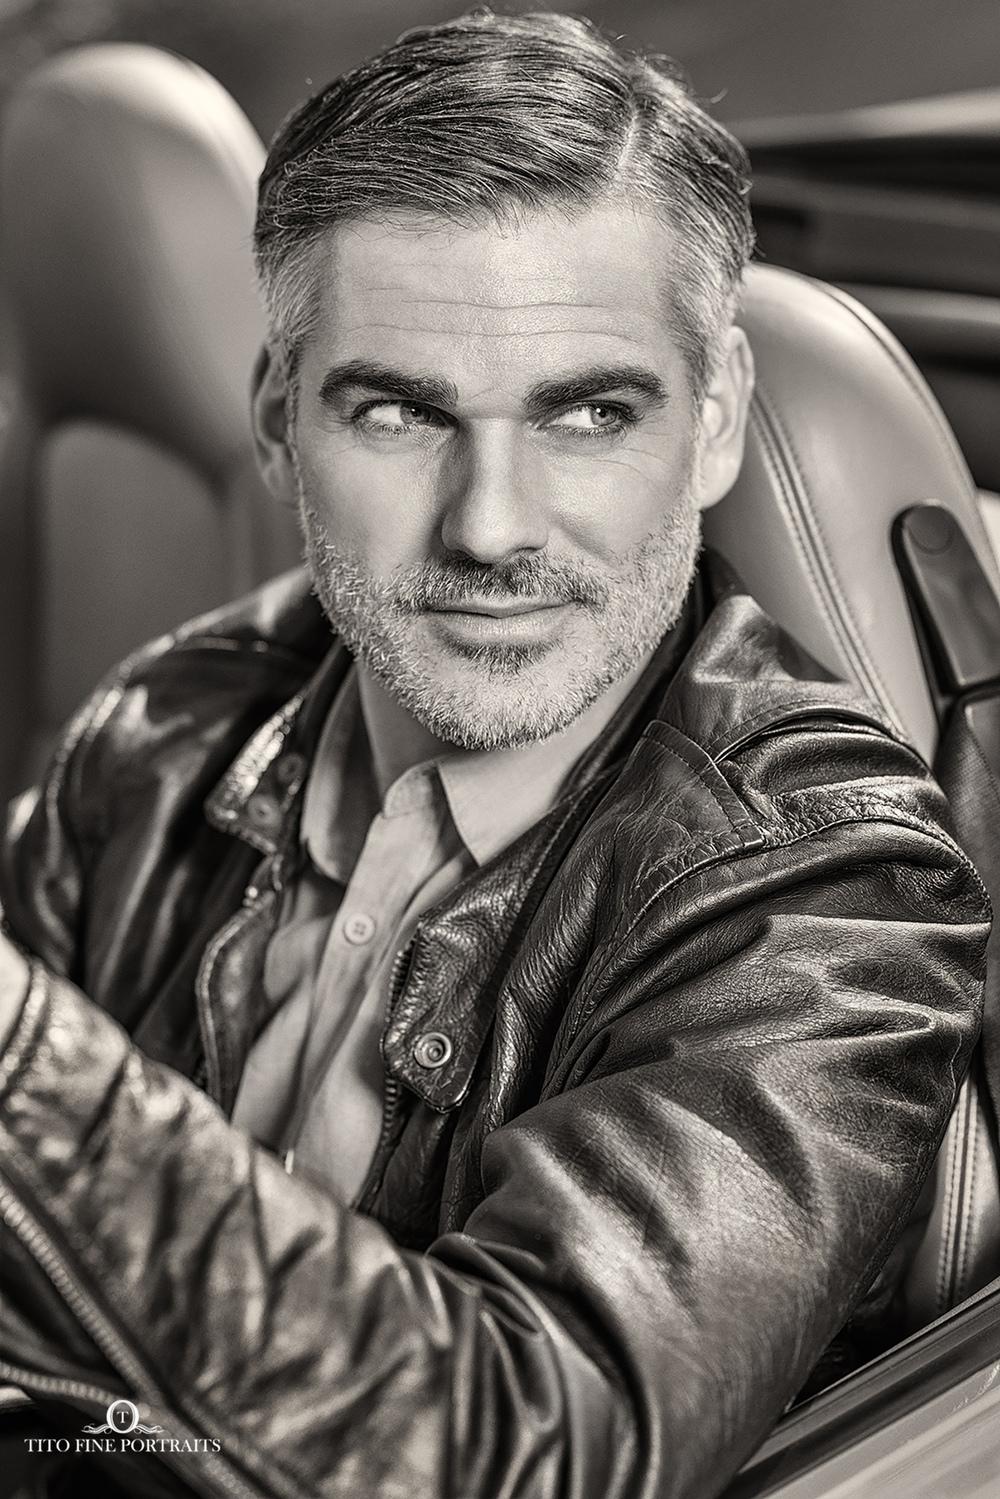 http://titofineportraits.com/man/Los-Angeles-Portrait-Photographer-2/